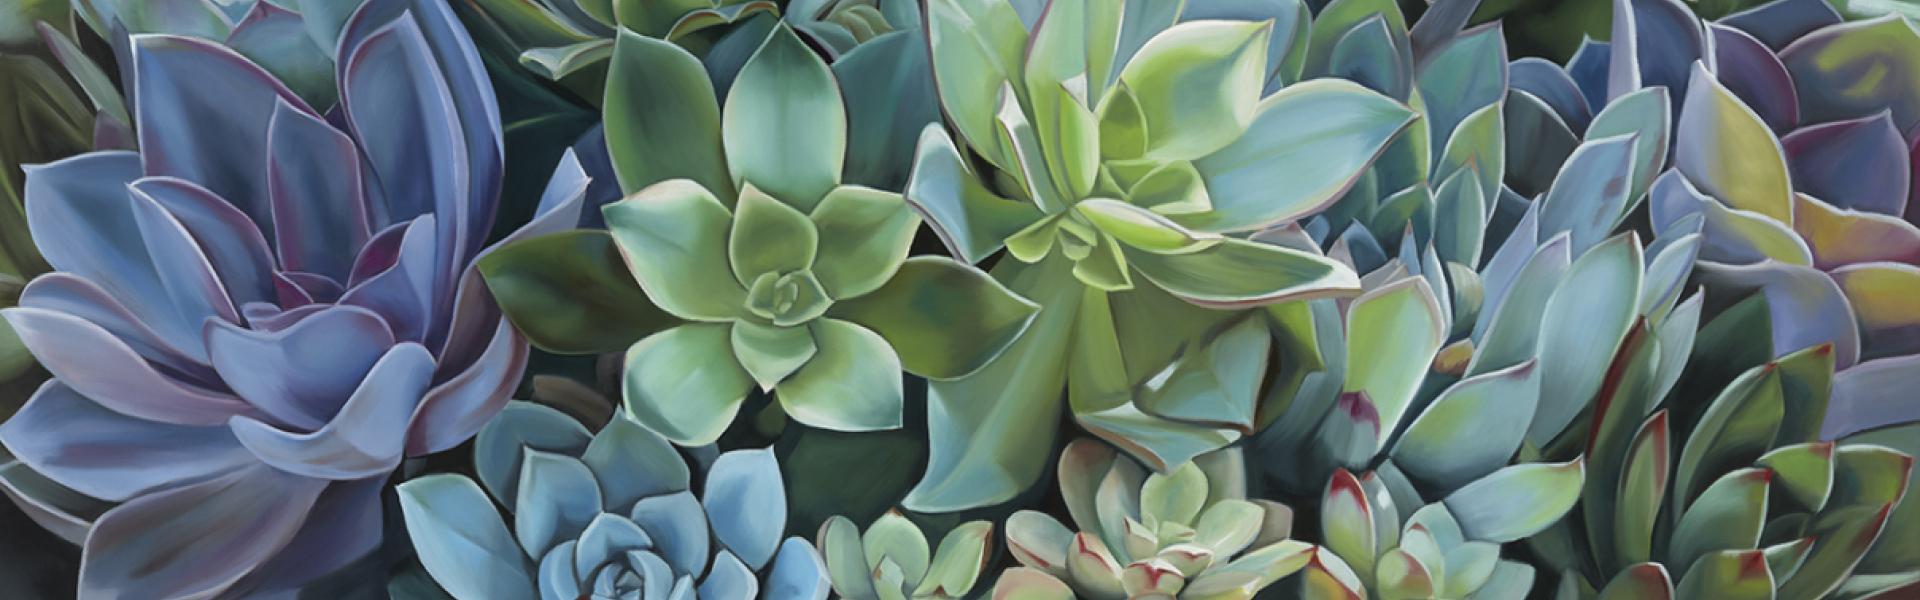 banner_succulents-a-f.20210516115417.jpg